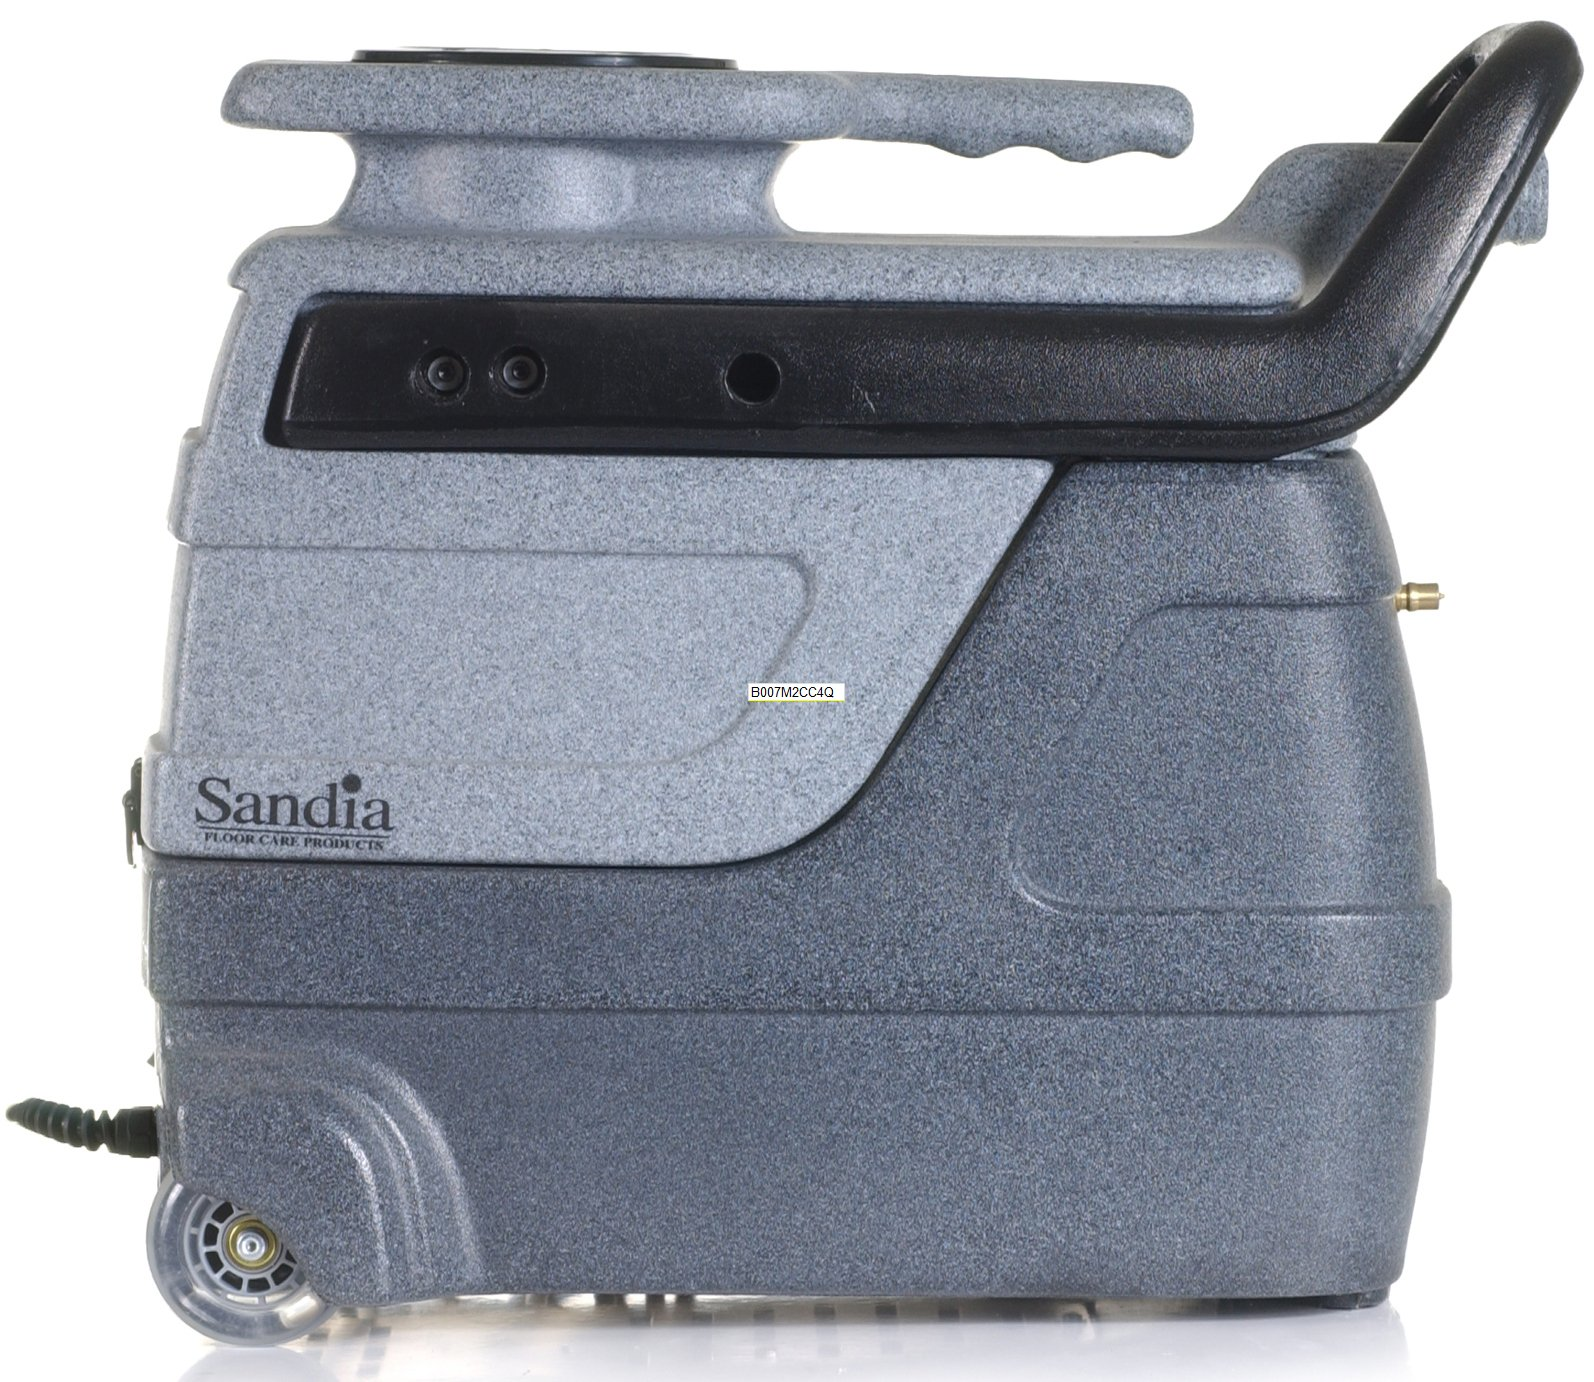 Sandia 50-1002 Spot-Xtract Commercial Extractor, 3 Gallon Capacity by Sandia Machines